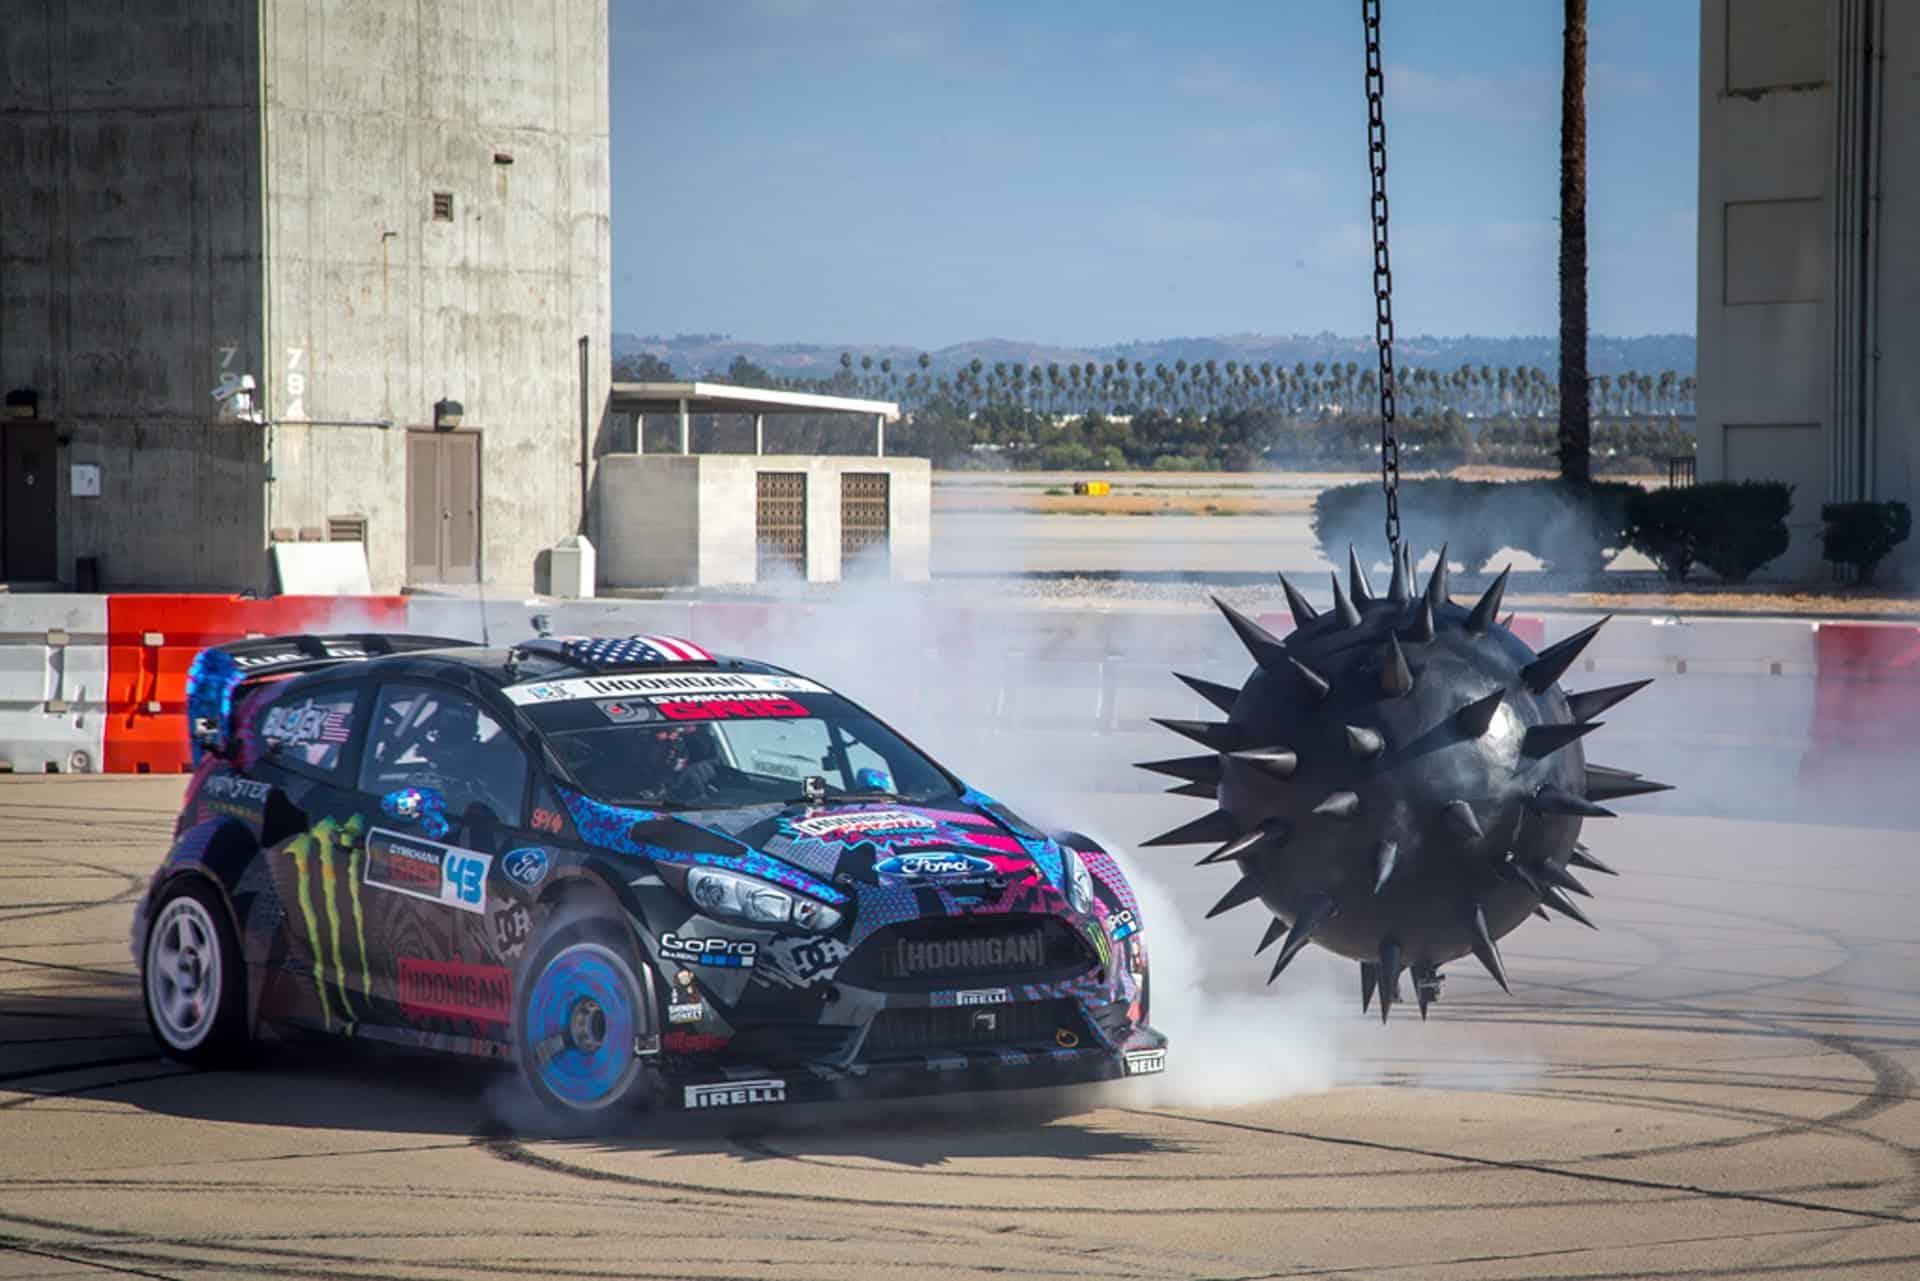 Ken Blocks drift Ford Fiesta